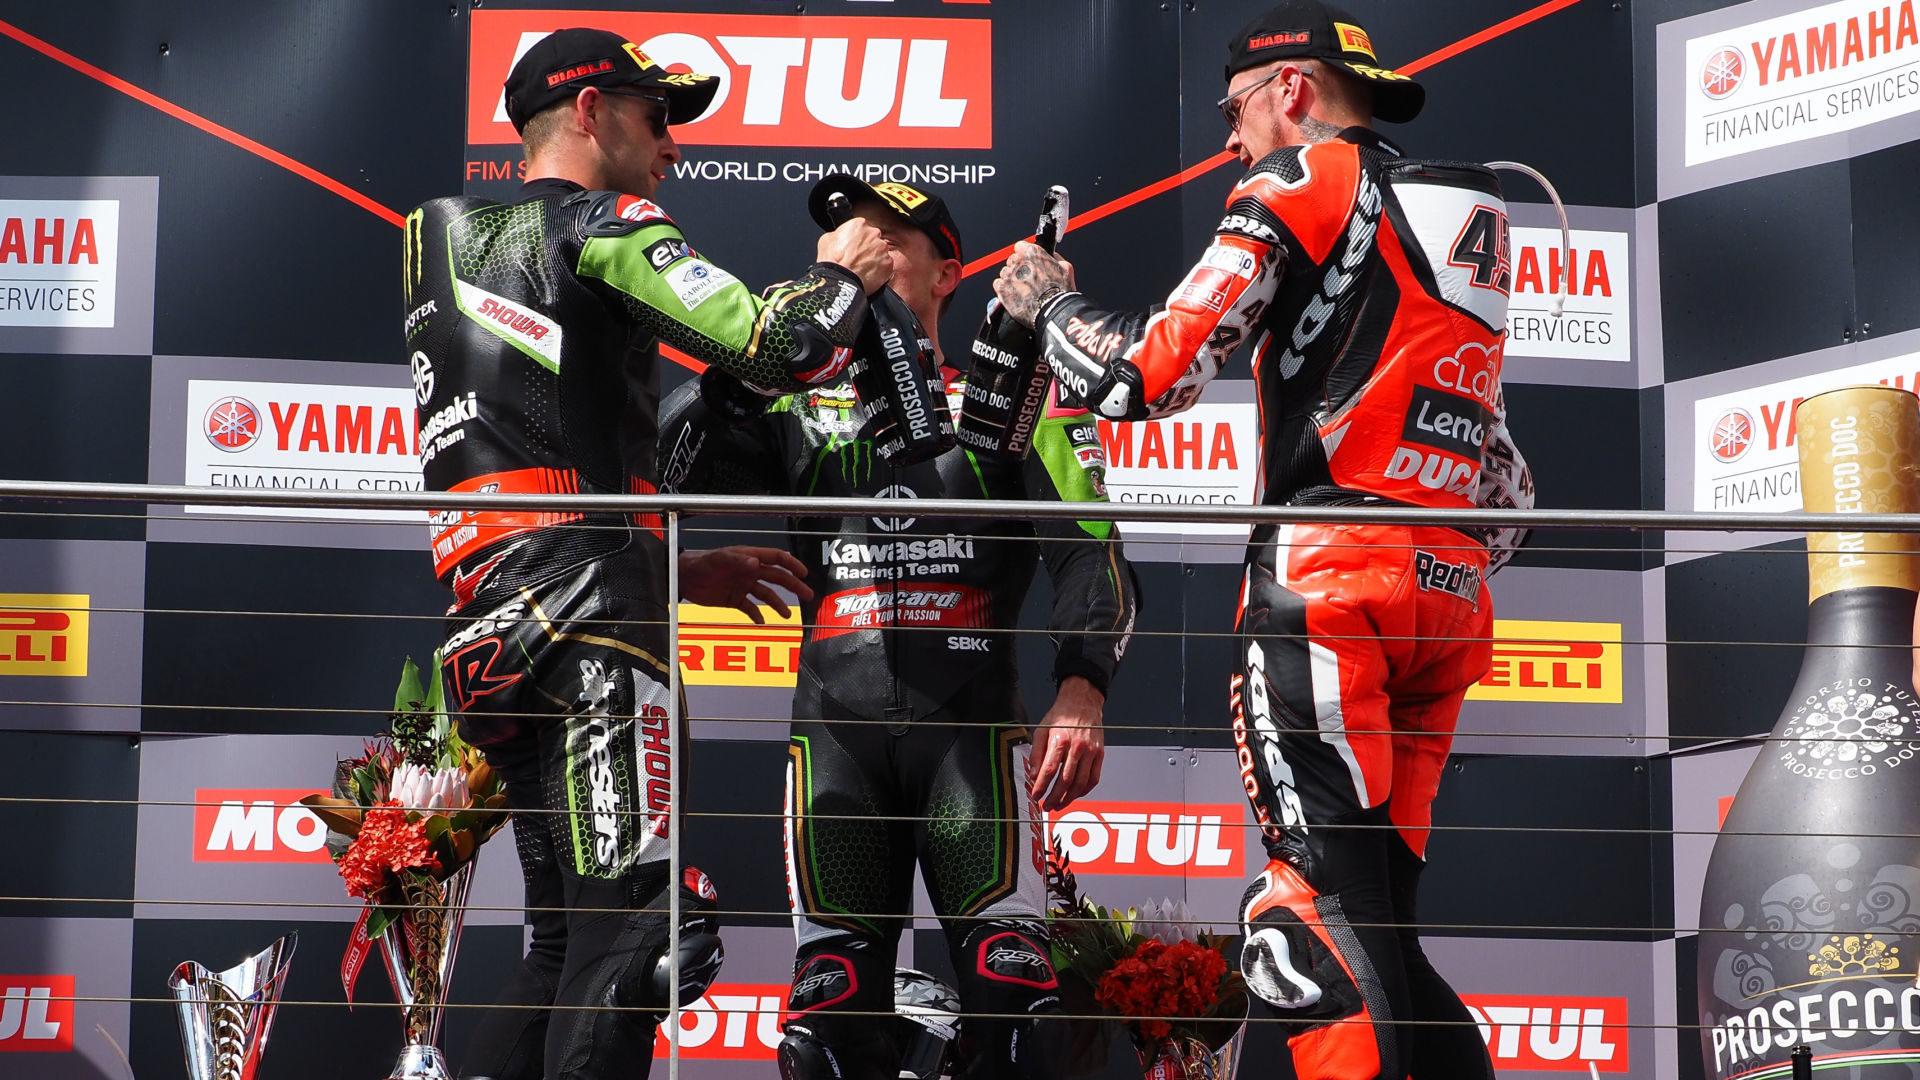 Jonathan Rea (left), Alex Lowes (center) and Scott Redding (right) celebrate with Prosecco champagne on a World Superbike podium. Photo courtesy Dorna.